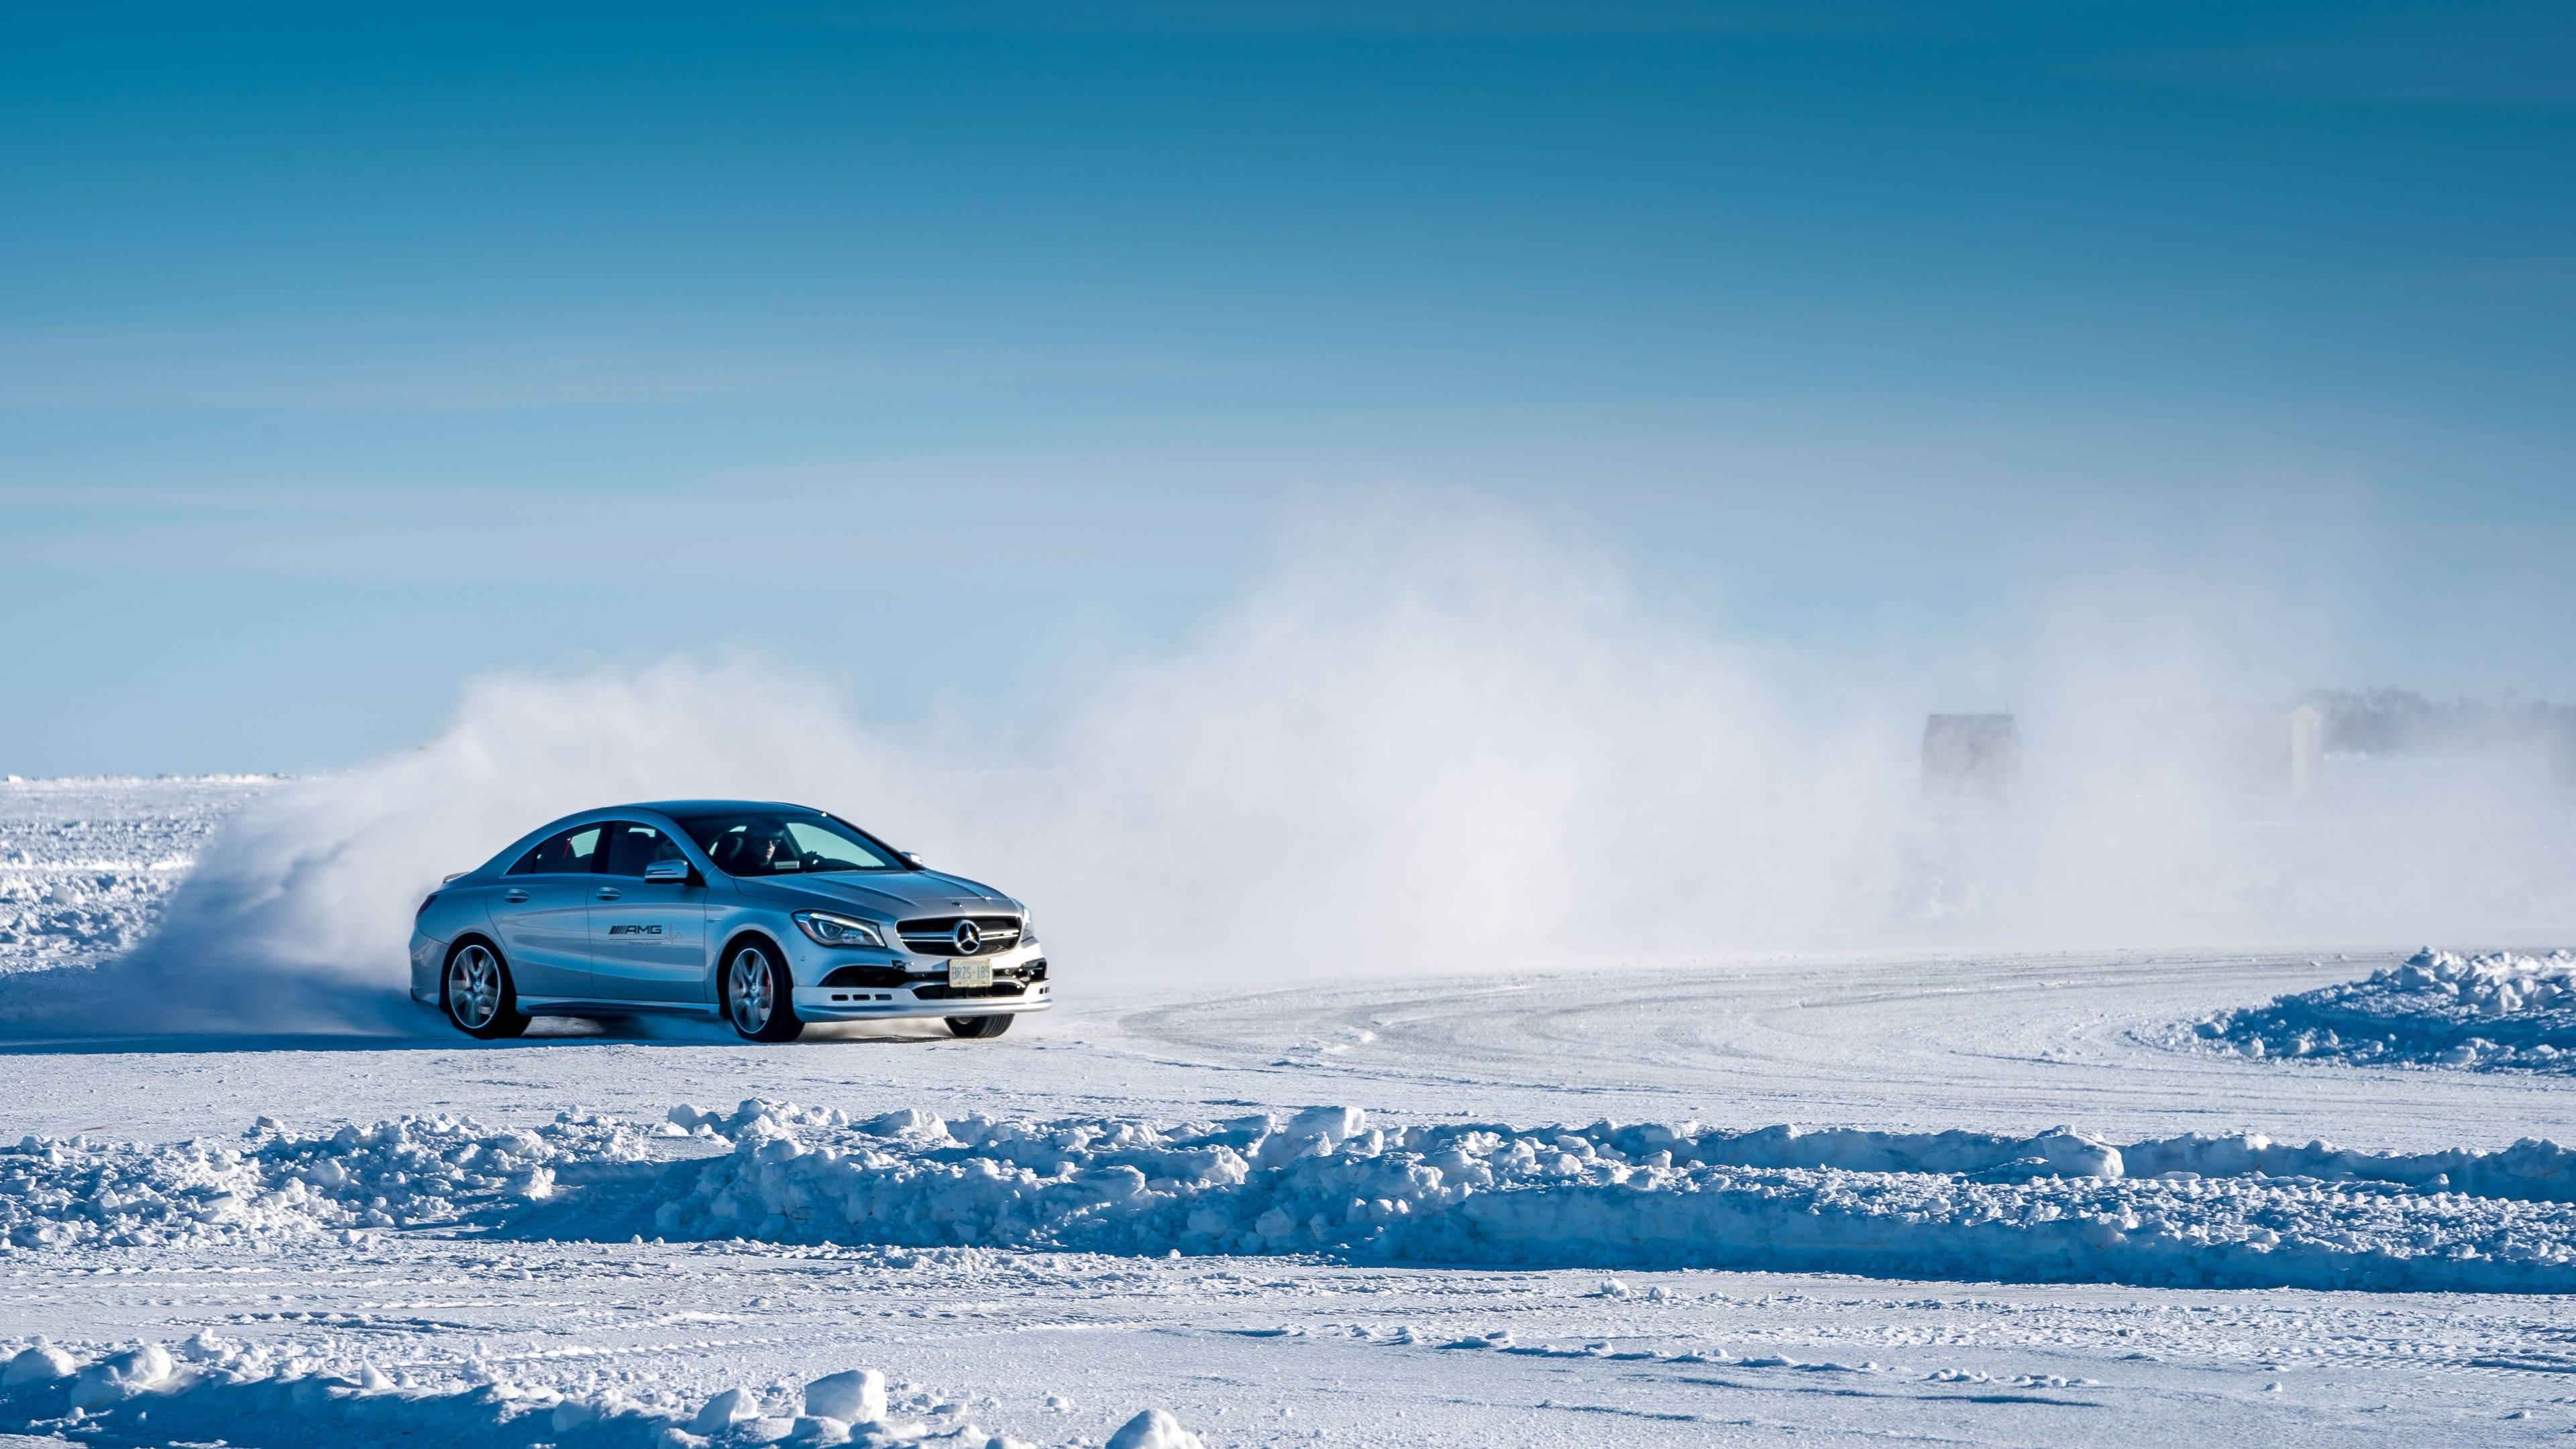 Mercedes-AMG drifting on ice